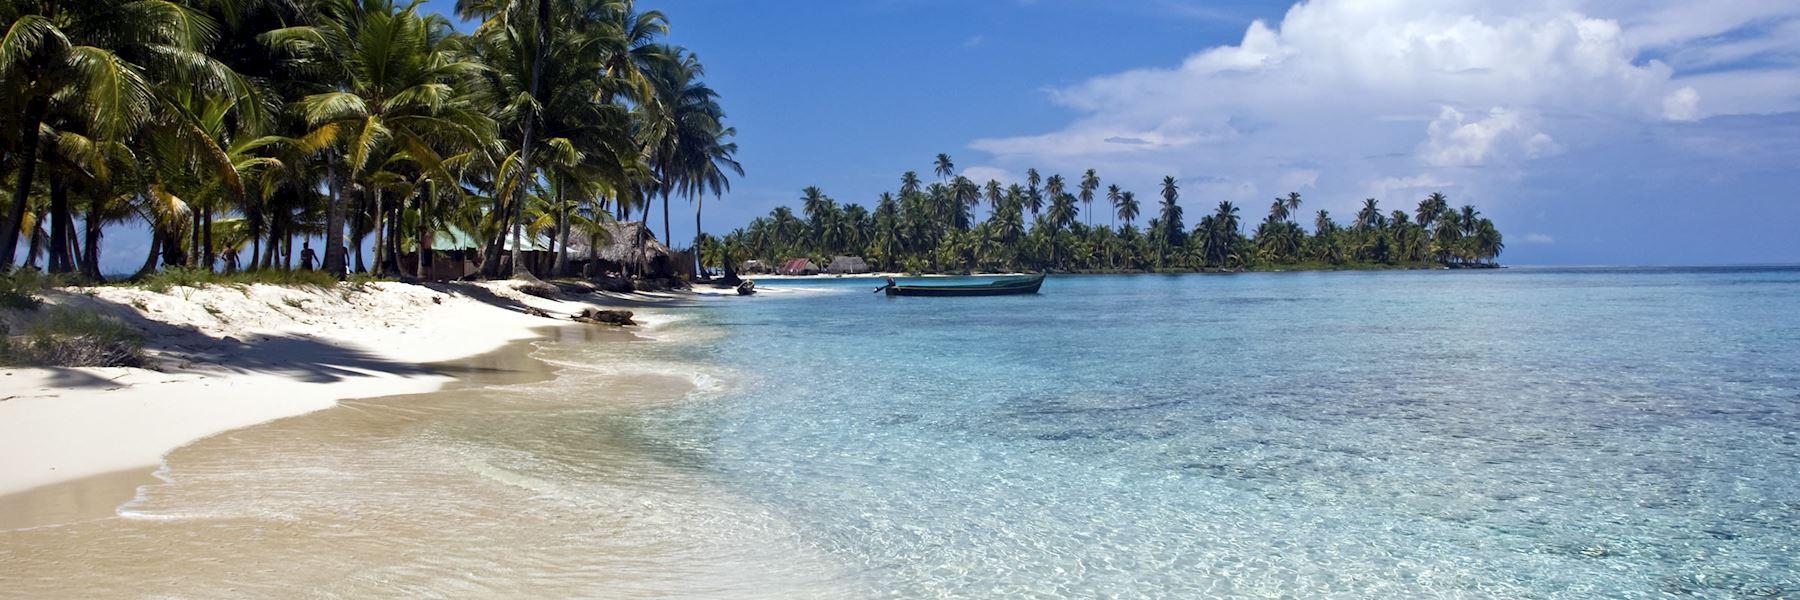 Cruises in Panama